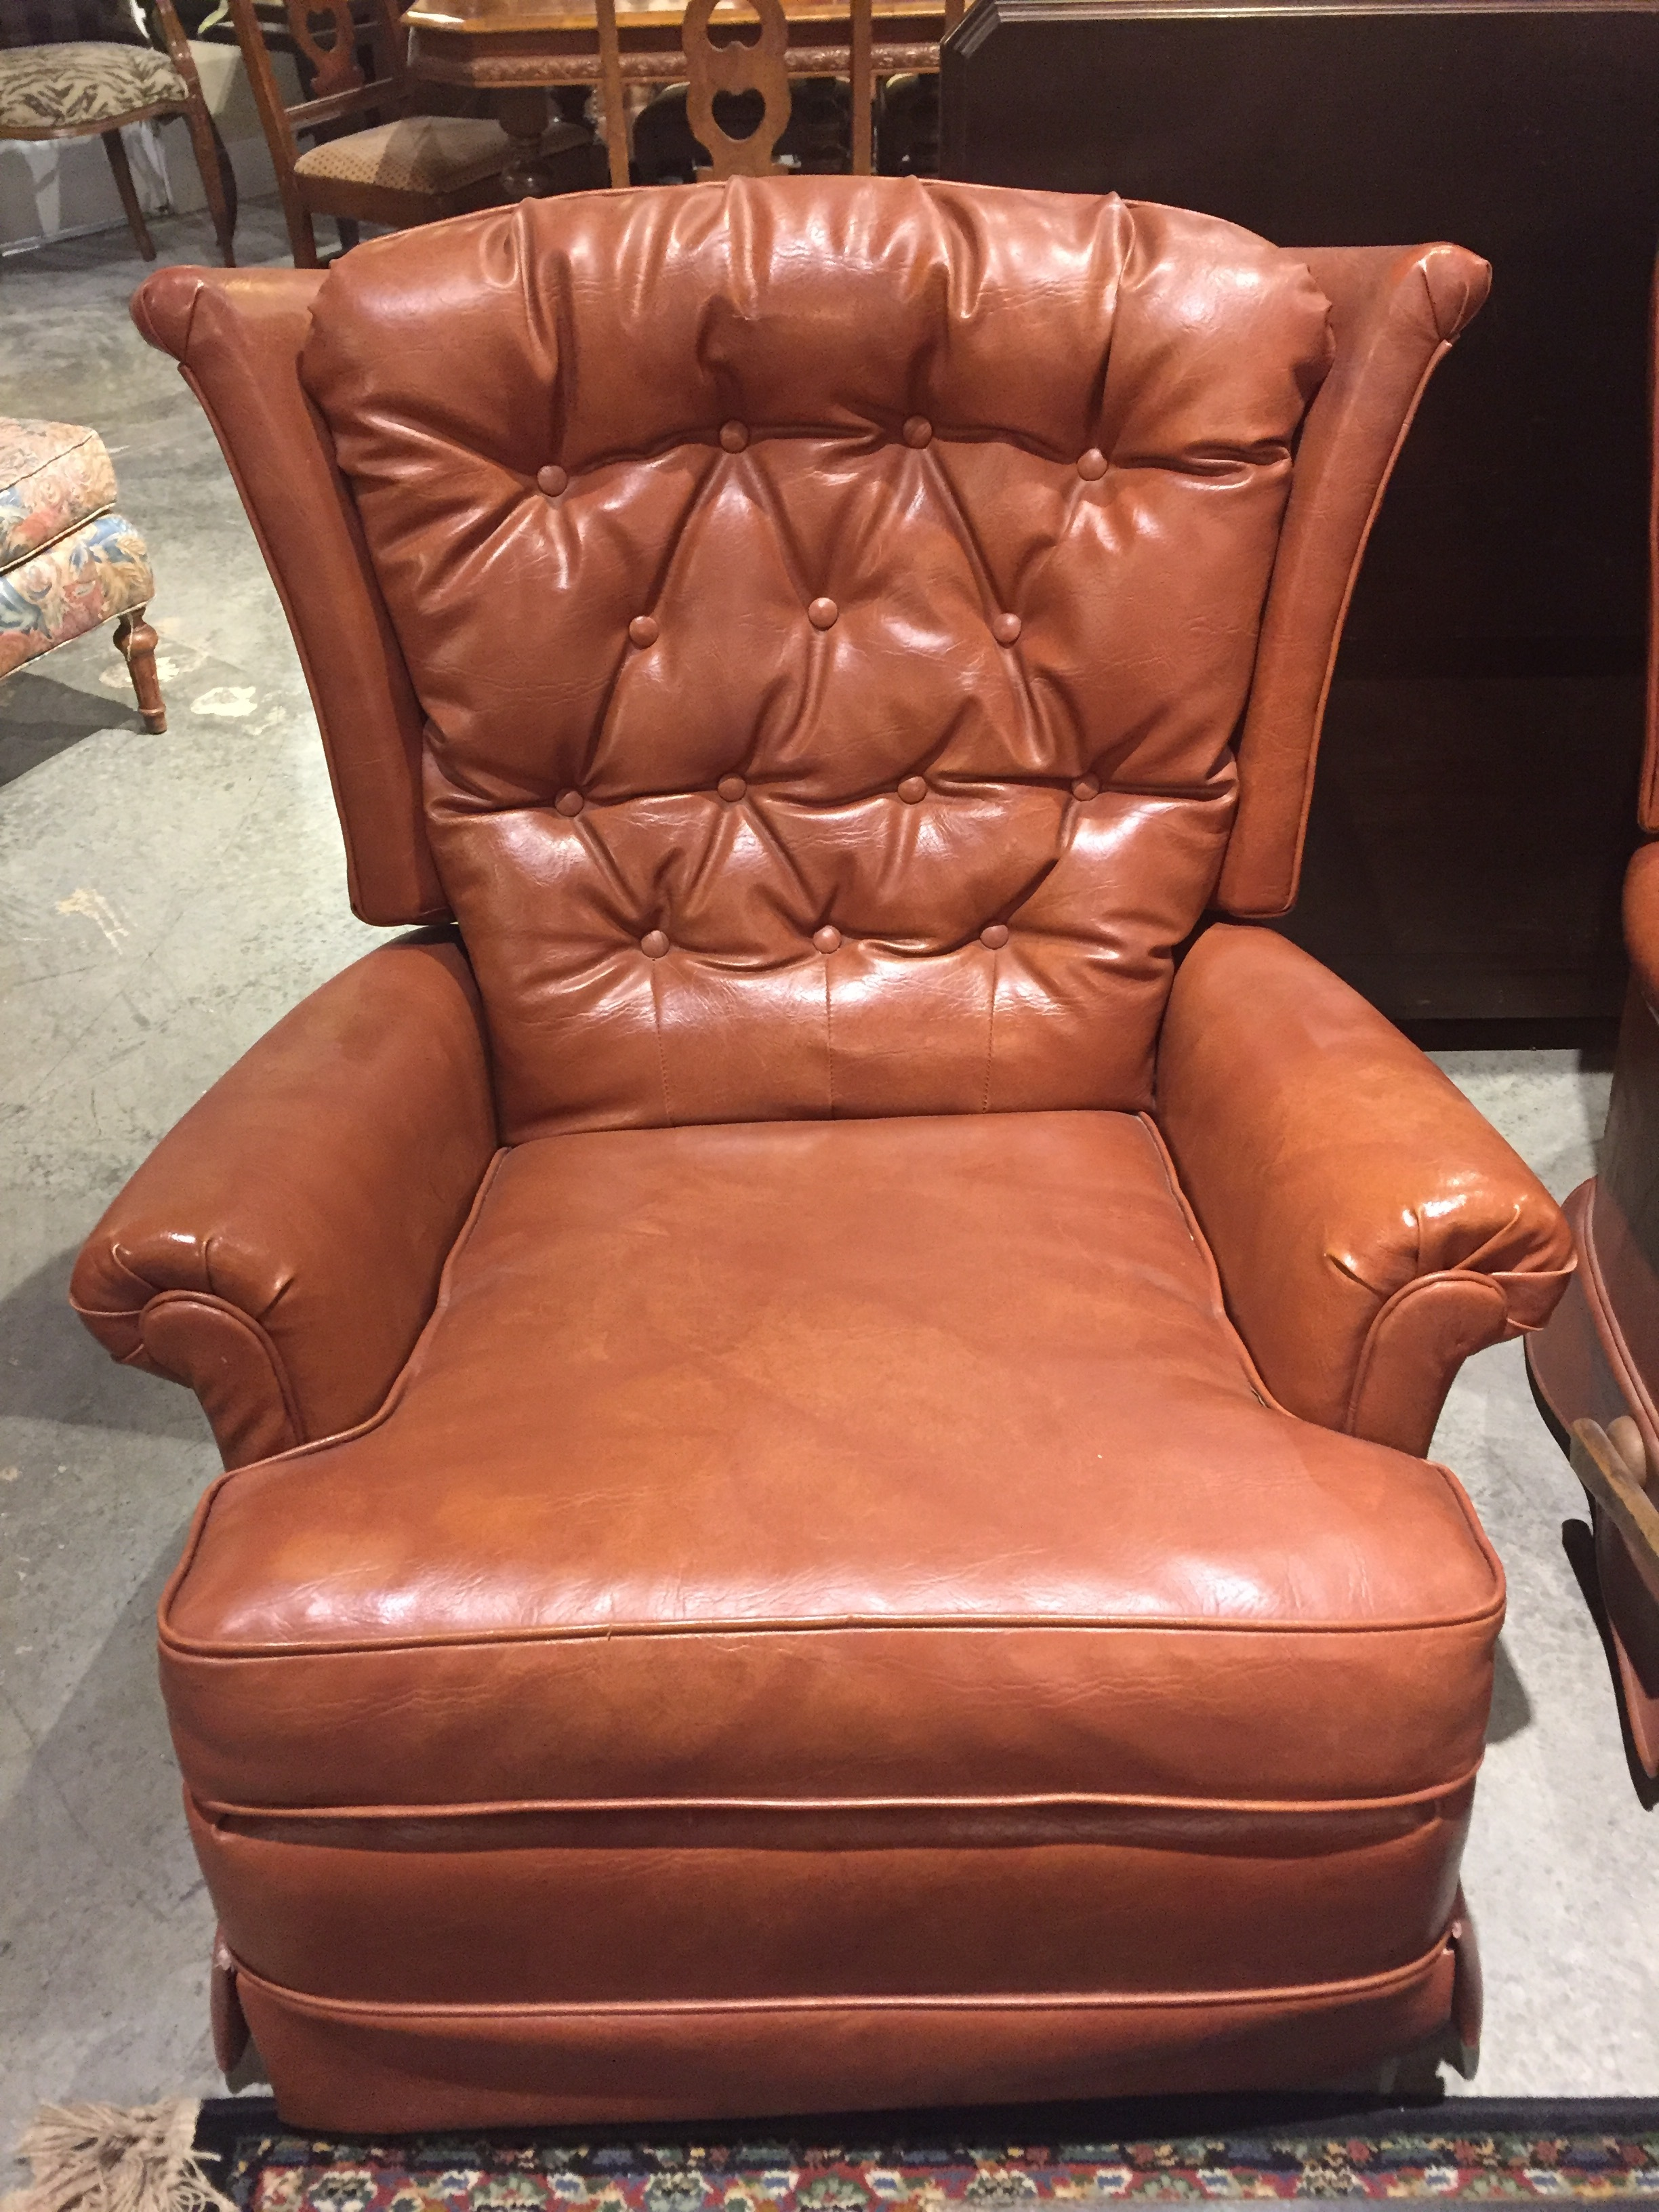 Vintage Recliner $119.95 - C1038 22655